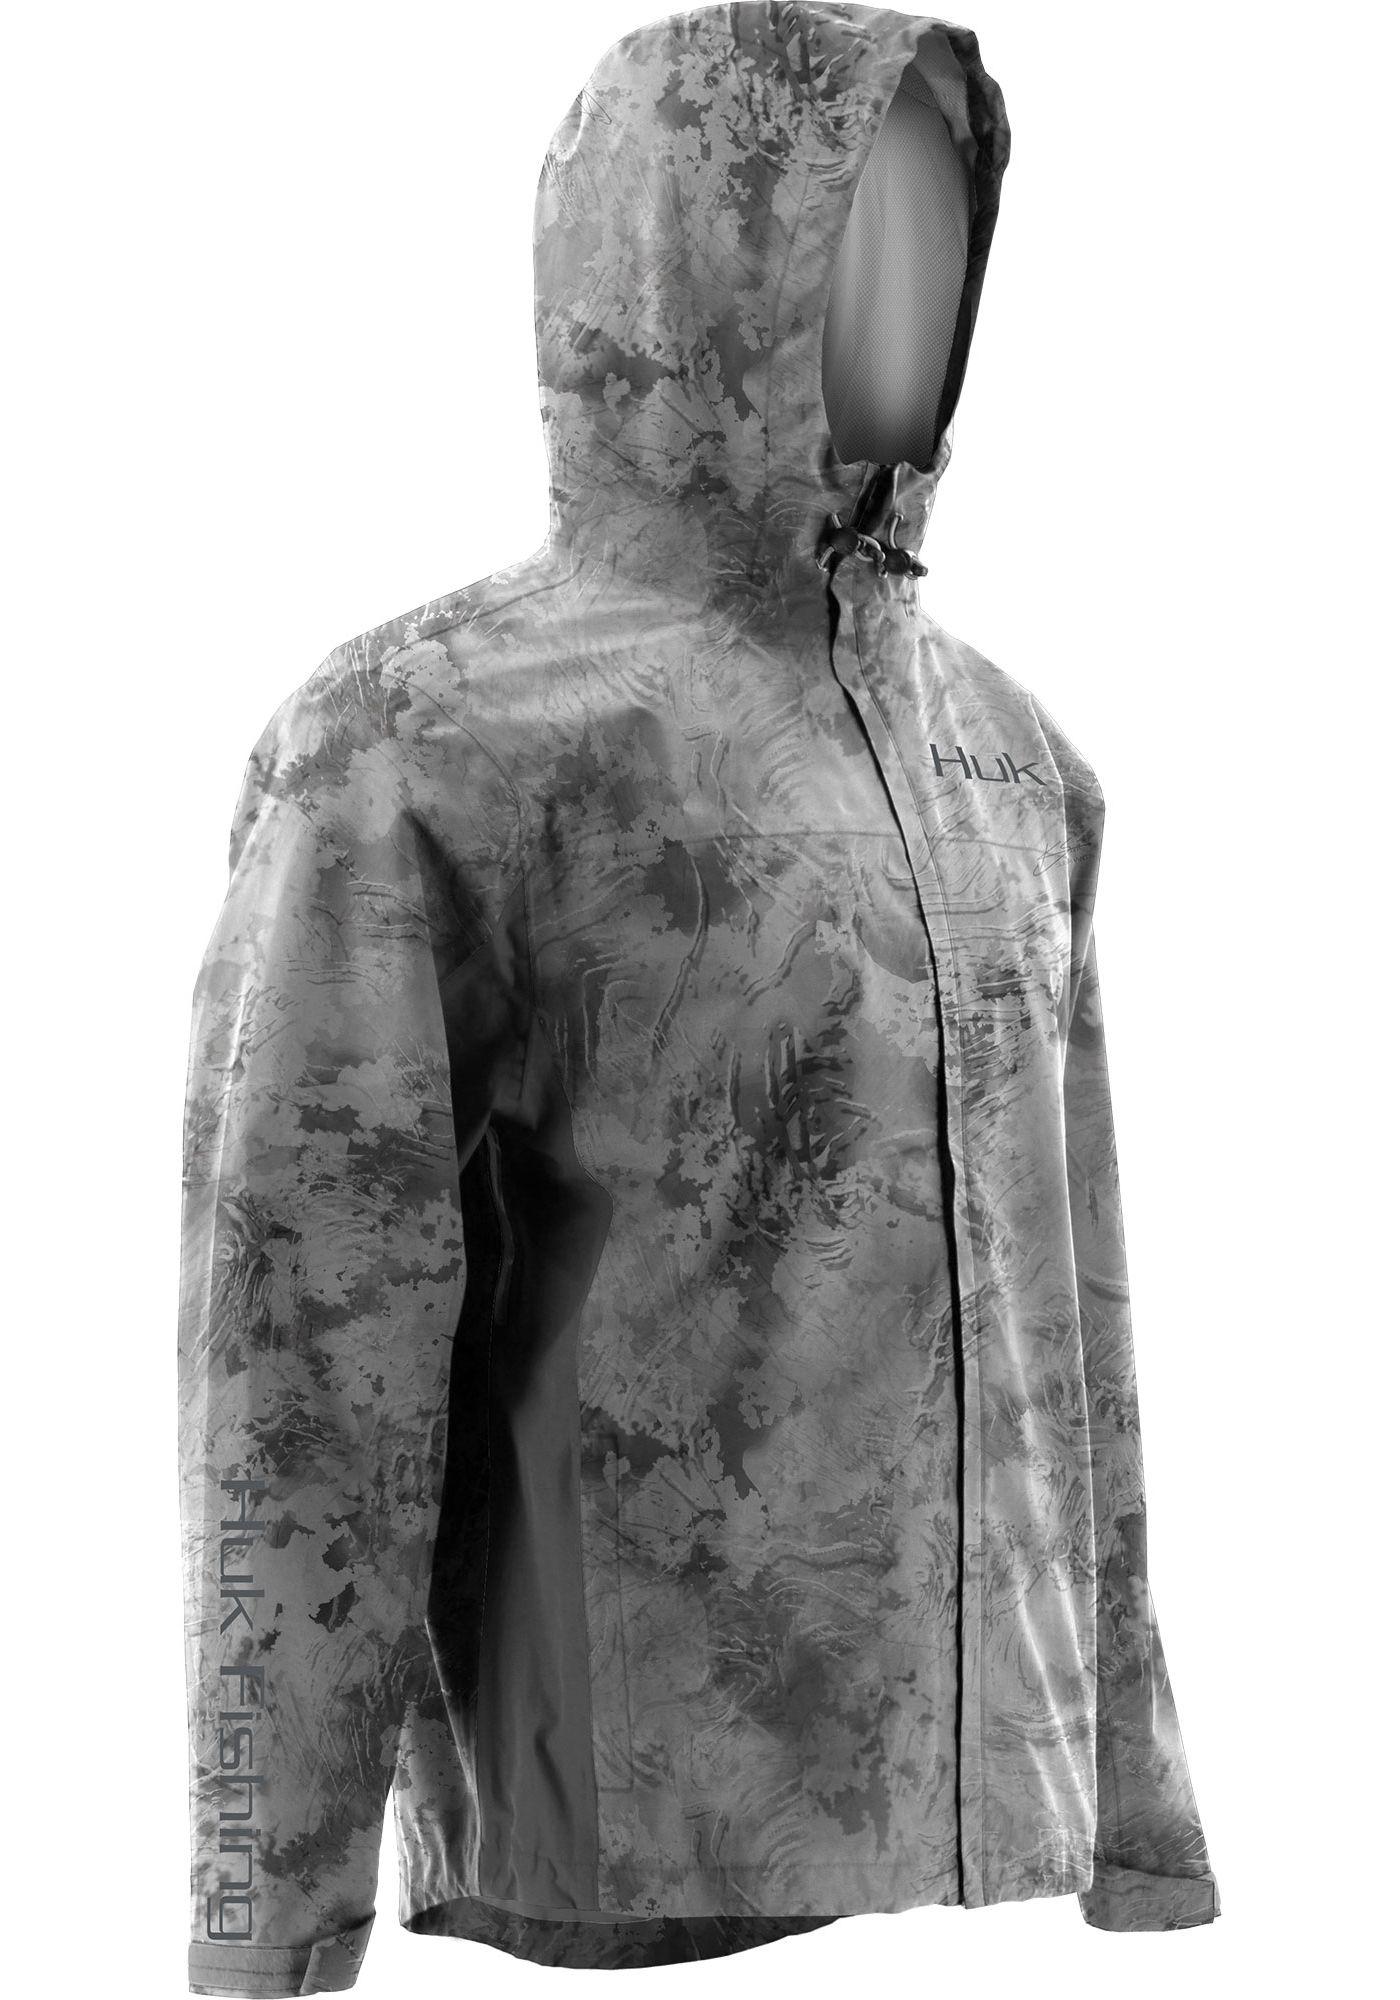 Huk Men's Subphantis Camo Packable Rain Jacket